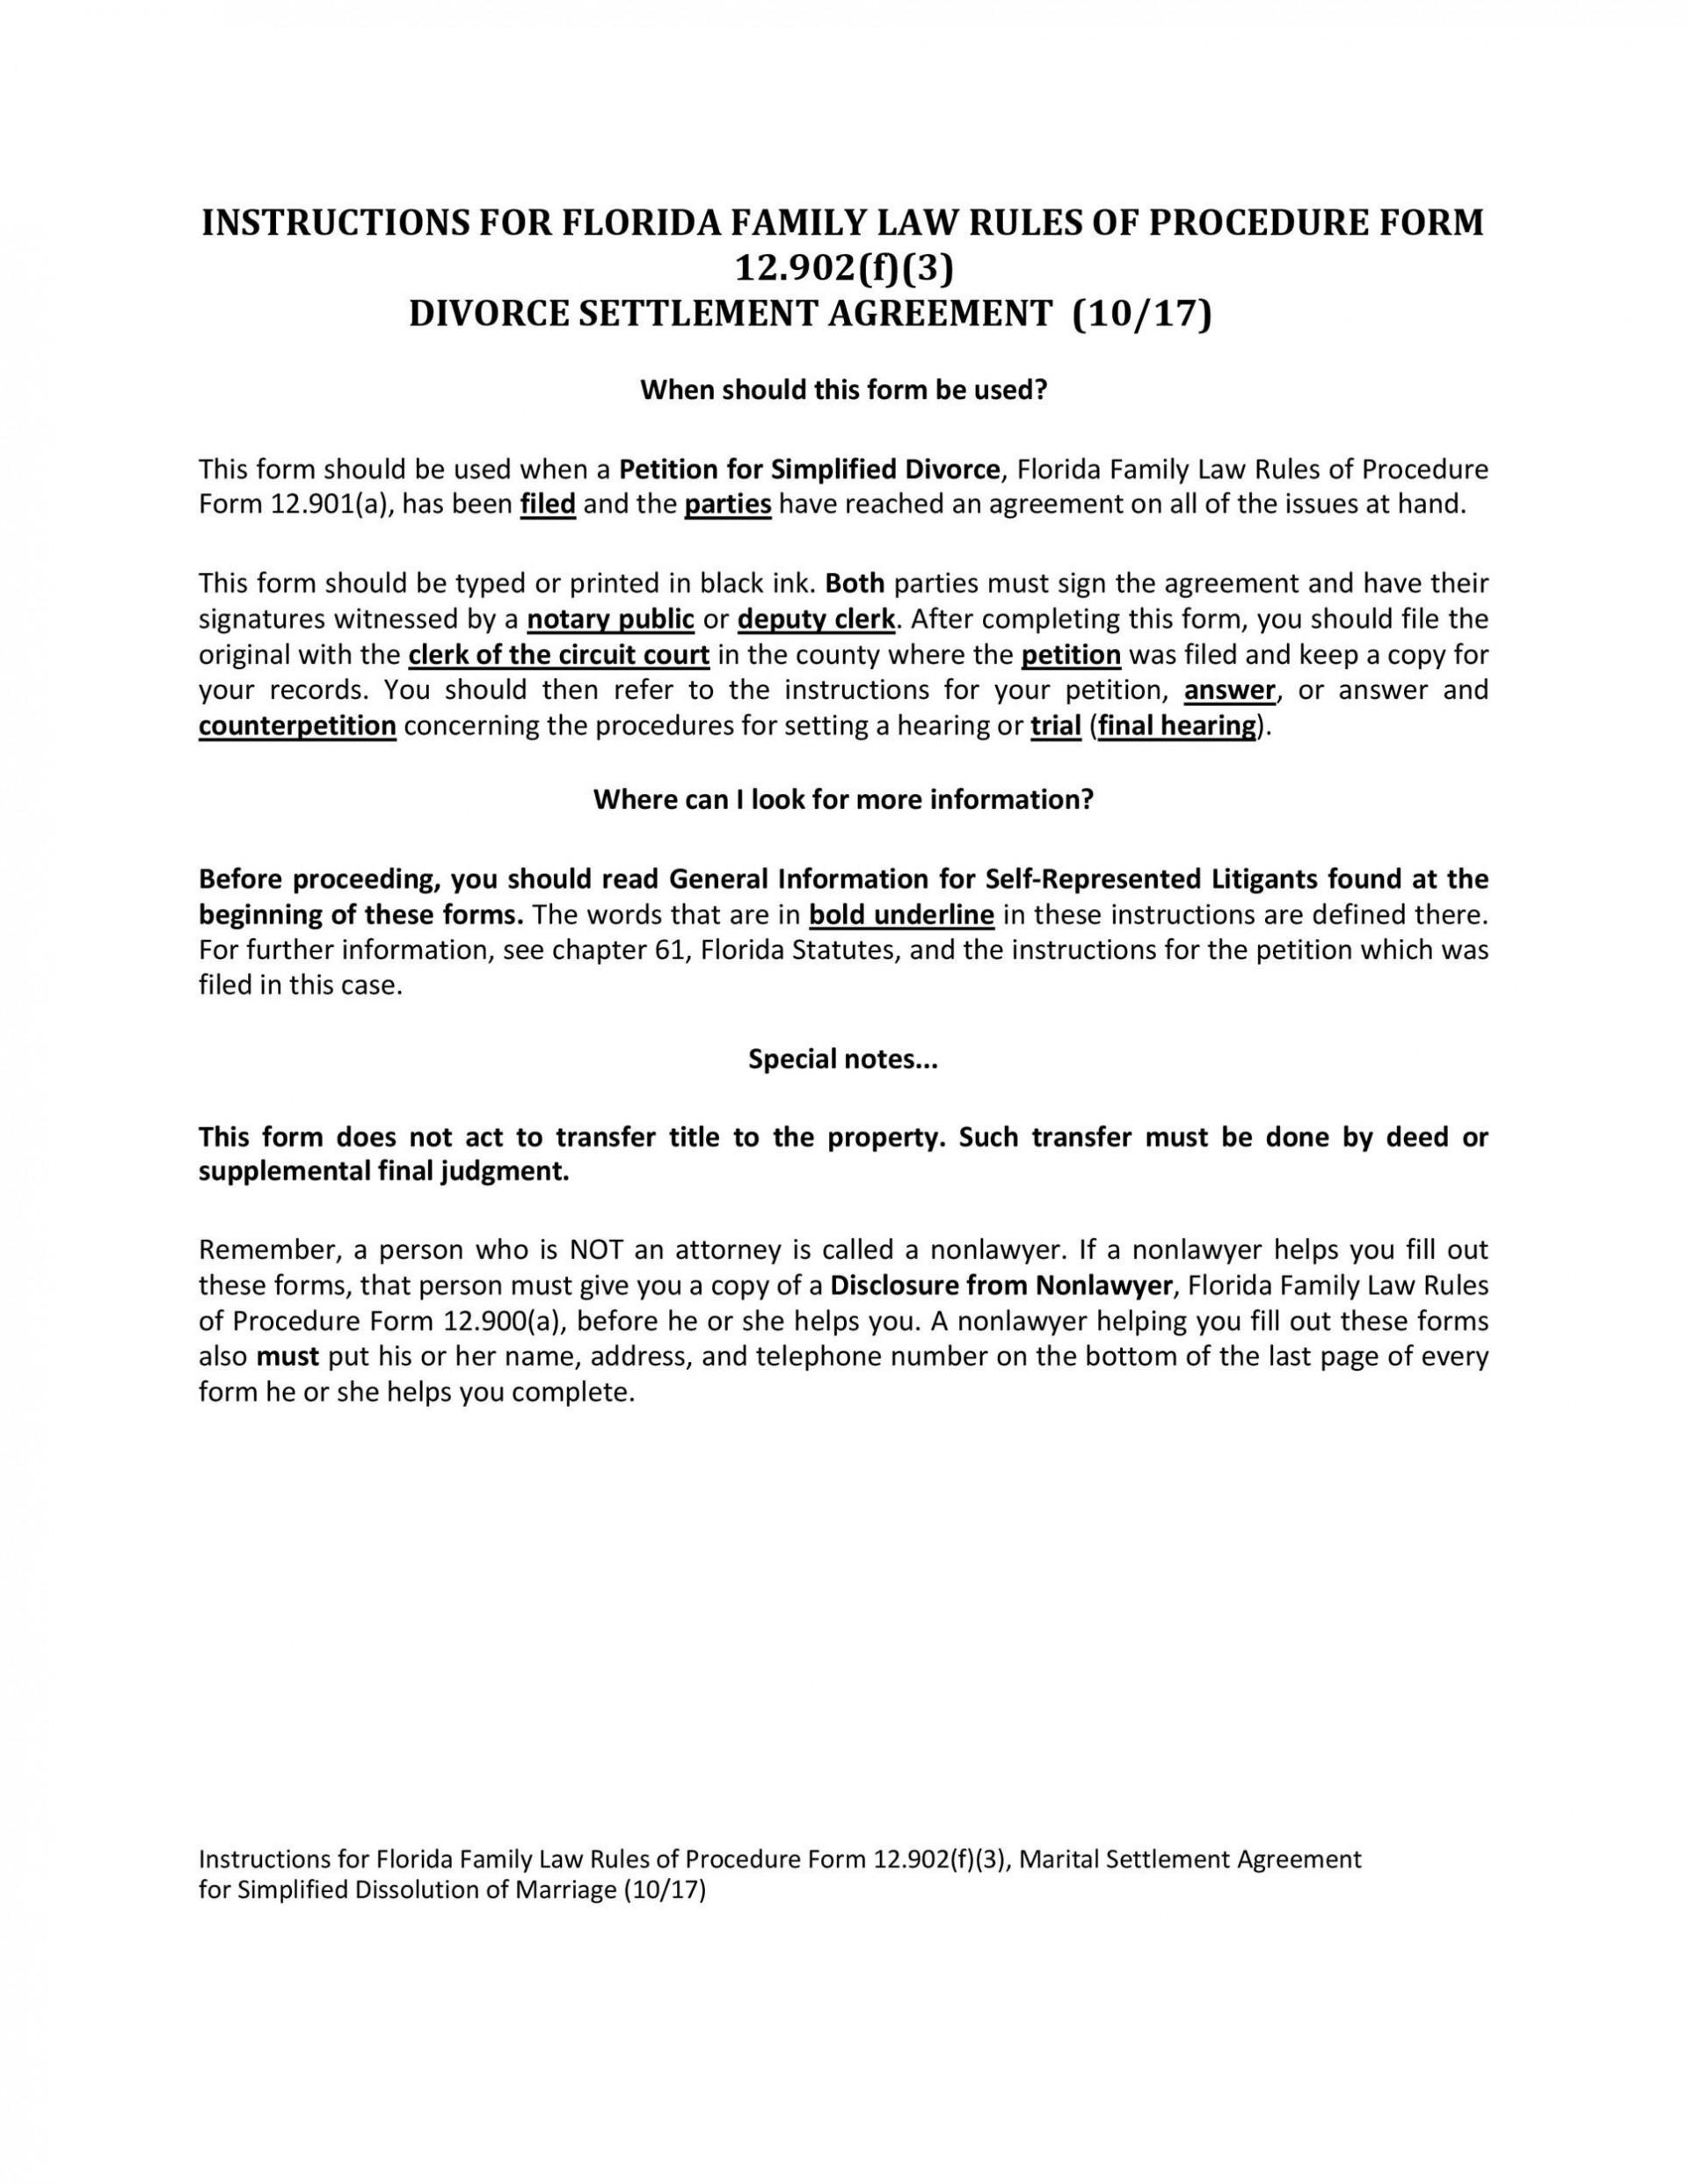 006 Unforgettable Divorce Settlement Agreement Template Highest Quality  Sample New York Marital Uk South Africa1920